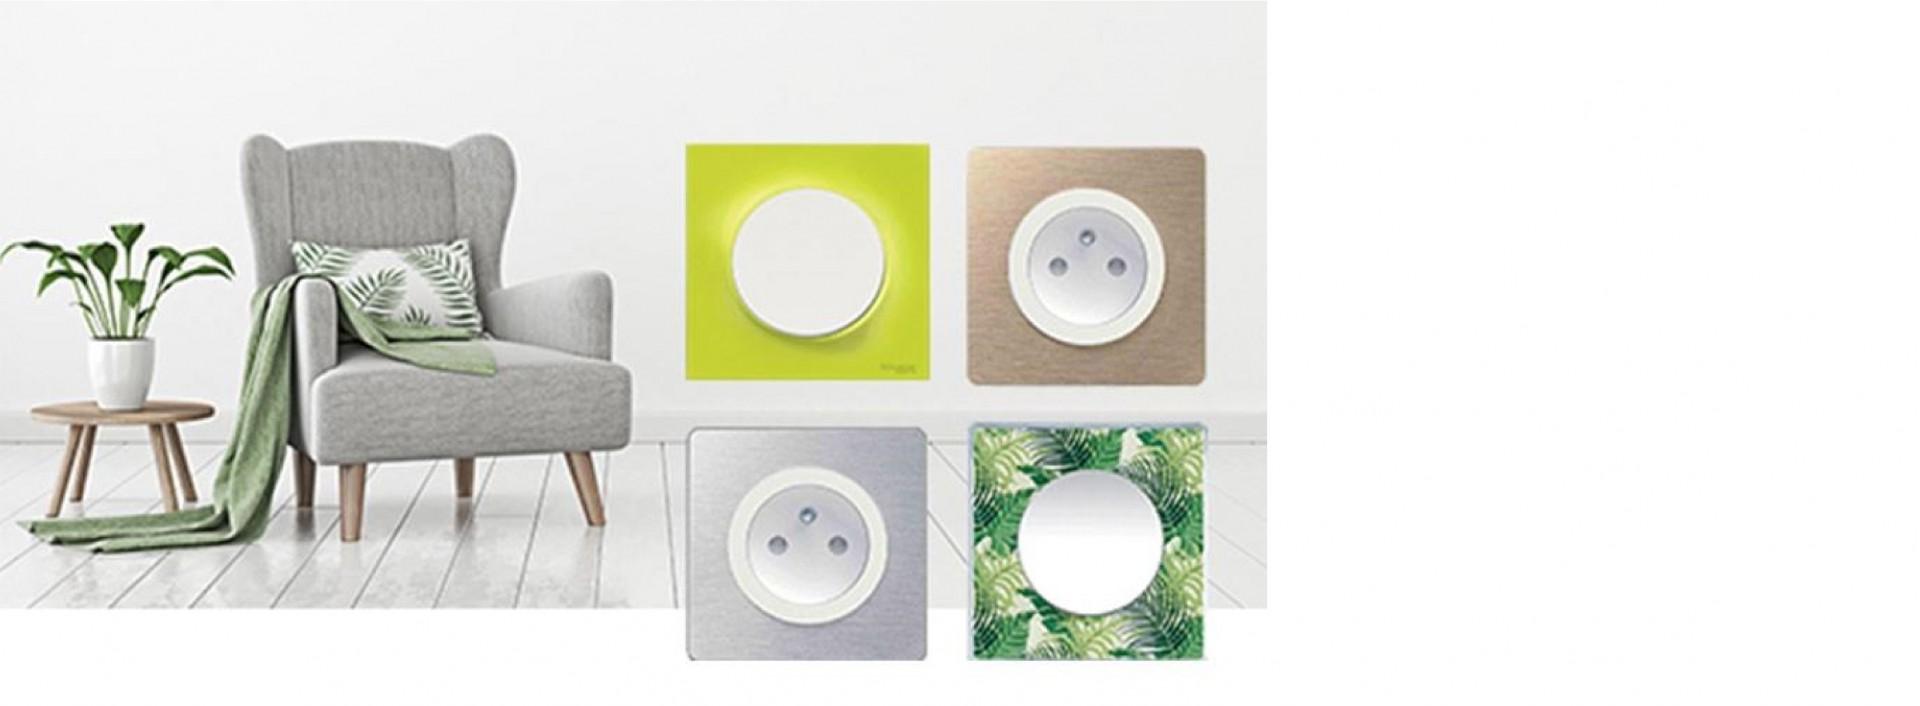 achat appareillage odace schneider electric e planetelec. Black Bedroom Furniture Sets. Home Design Ideas